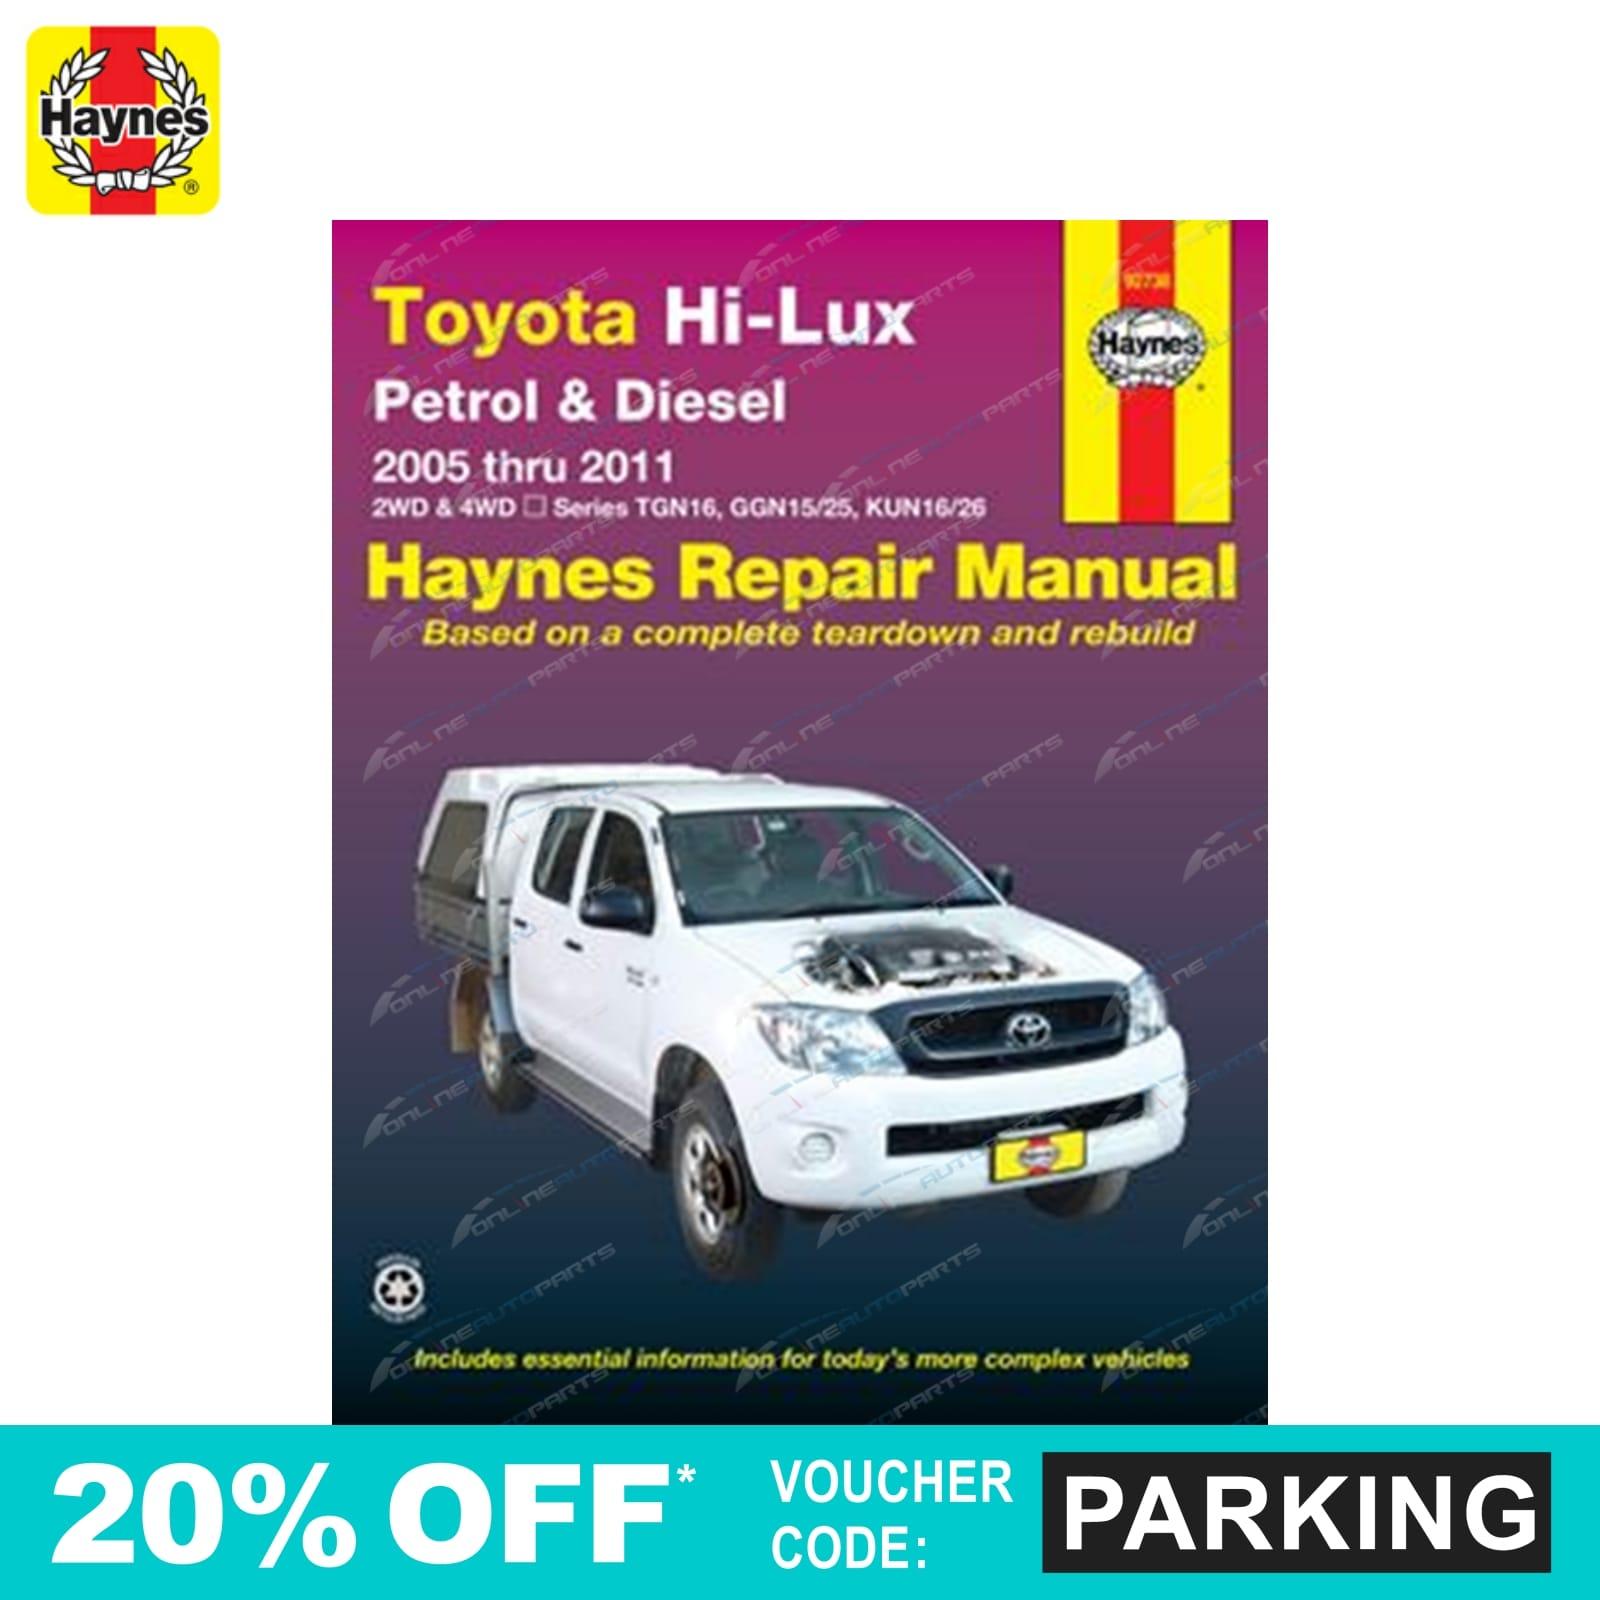 haynes car repair manual book suits toyota hilux 2x4 4wd ute rh ebay com au Repair Manuals Service ManualsOnline